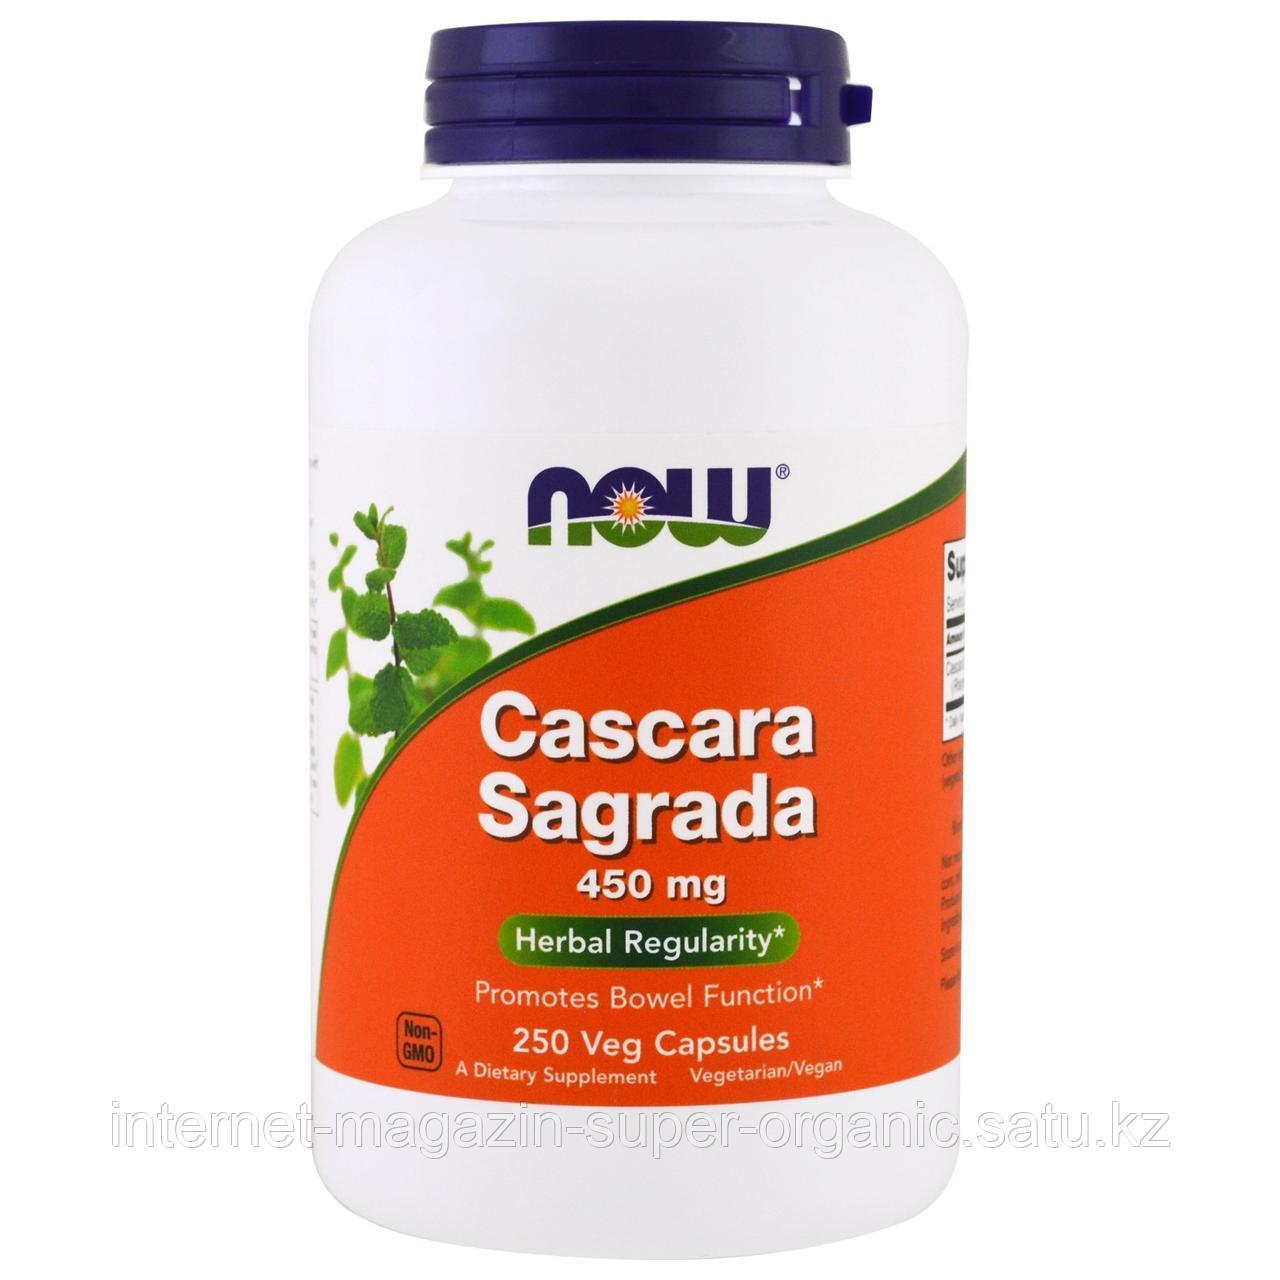 Каскара саграда (крушина) Cascara Sagrada, 450 мг, 250 капсул, Now Foods